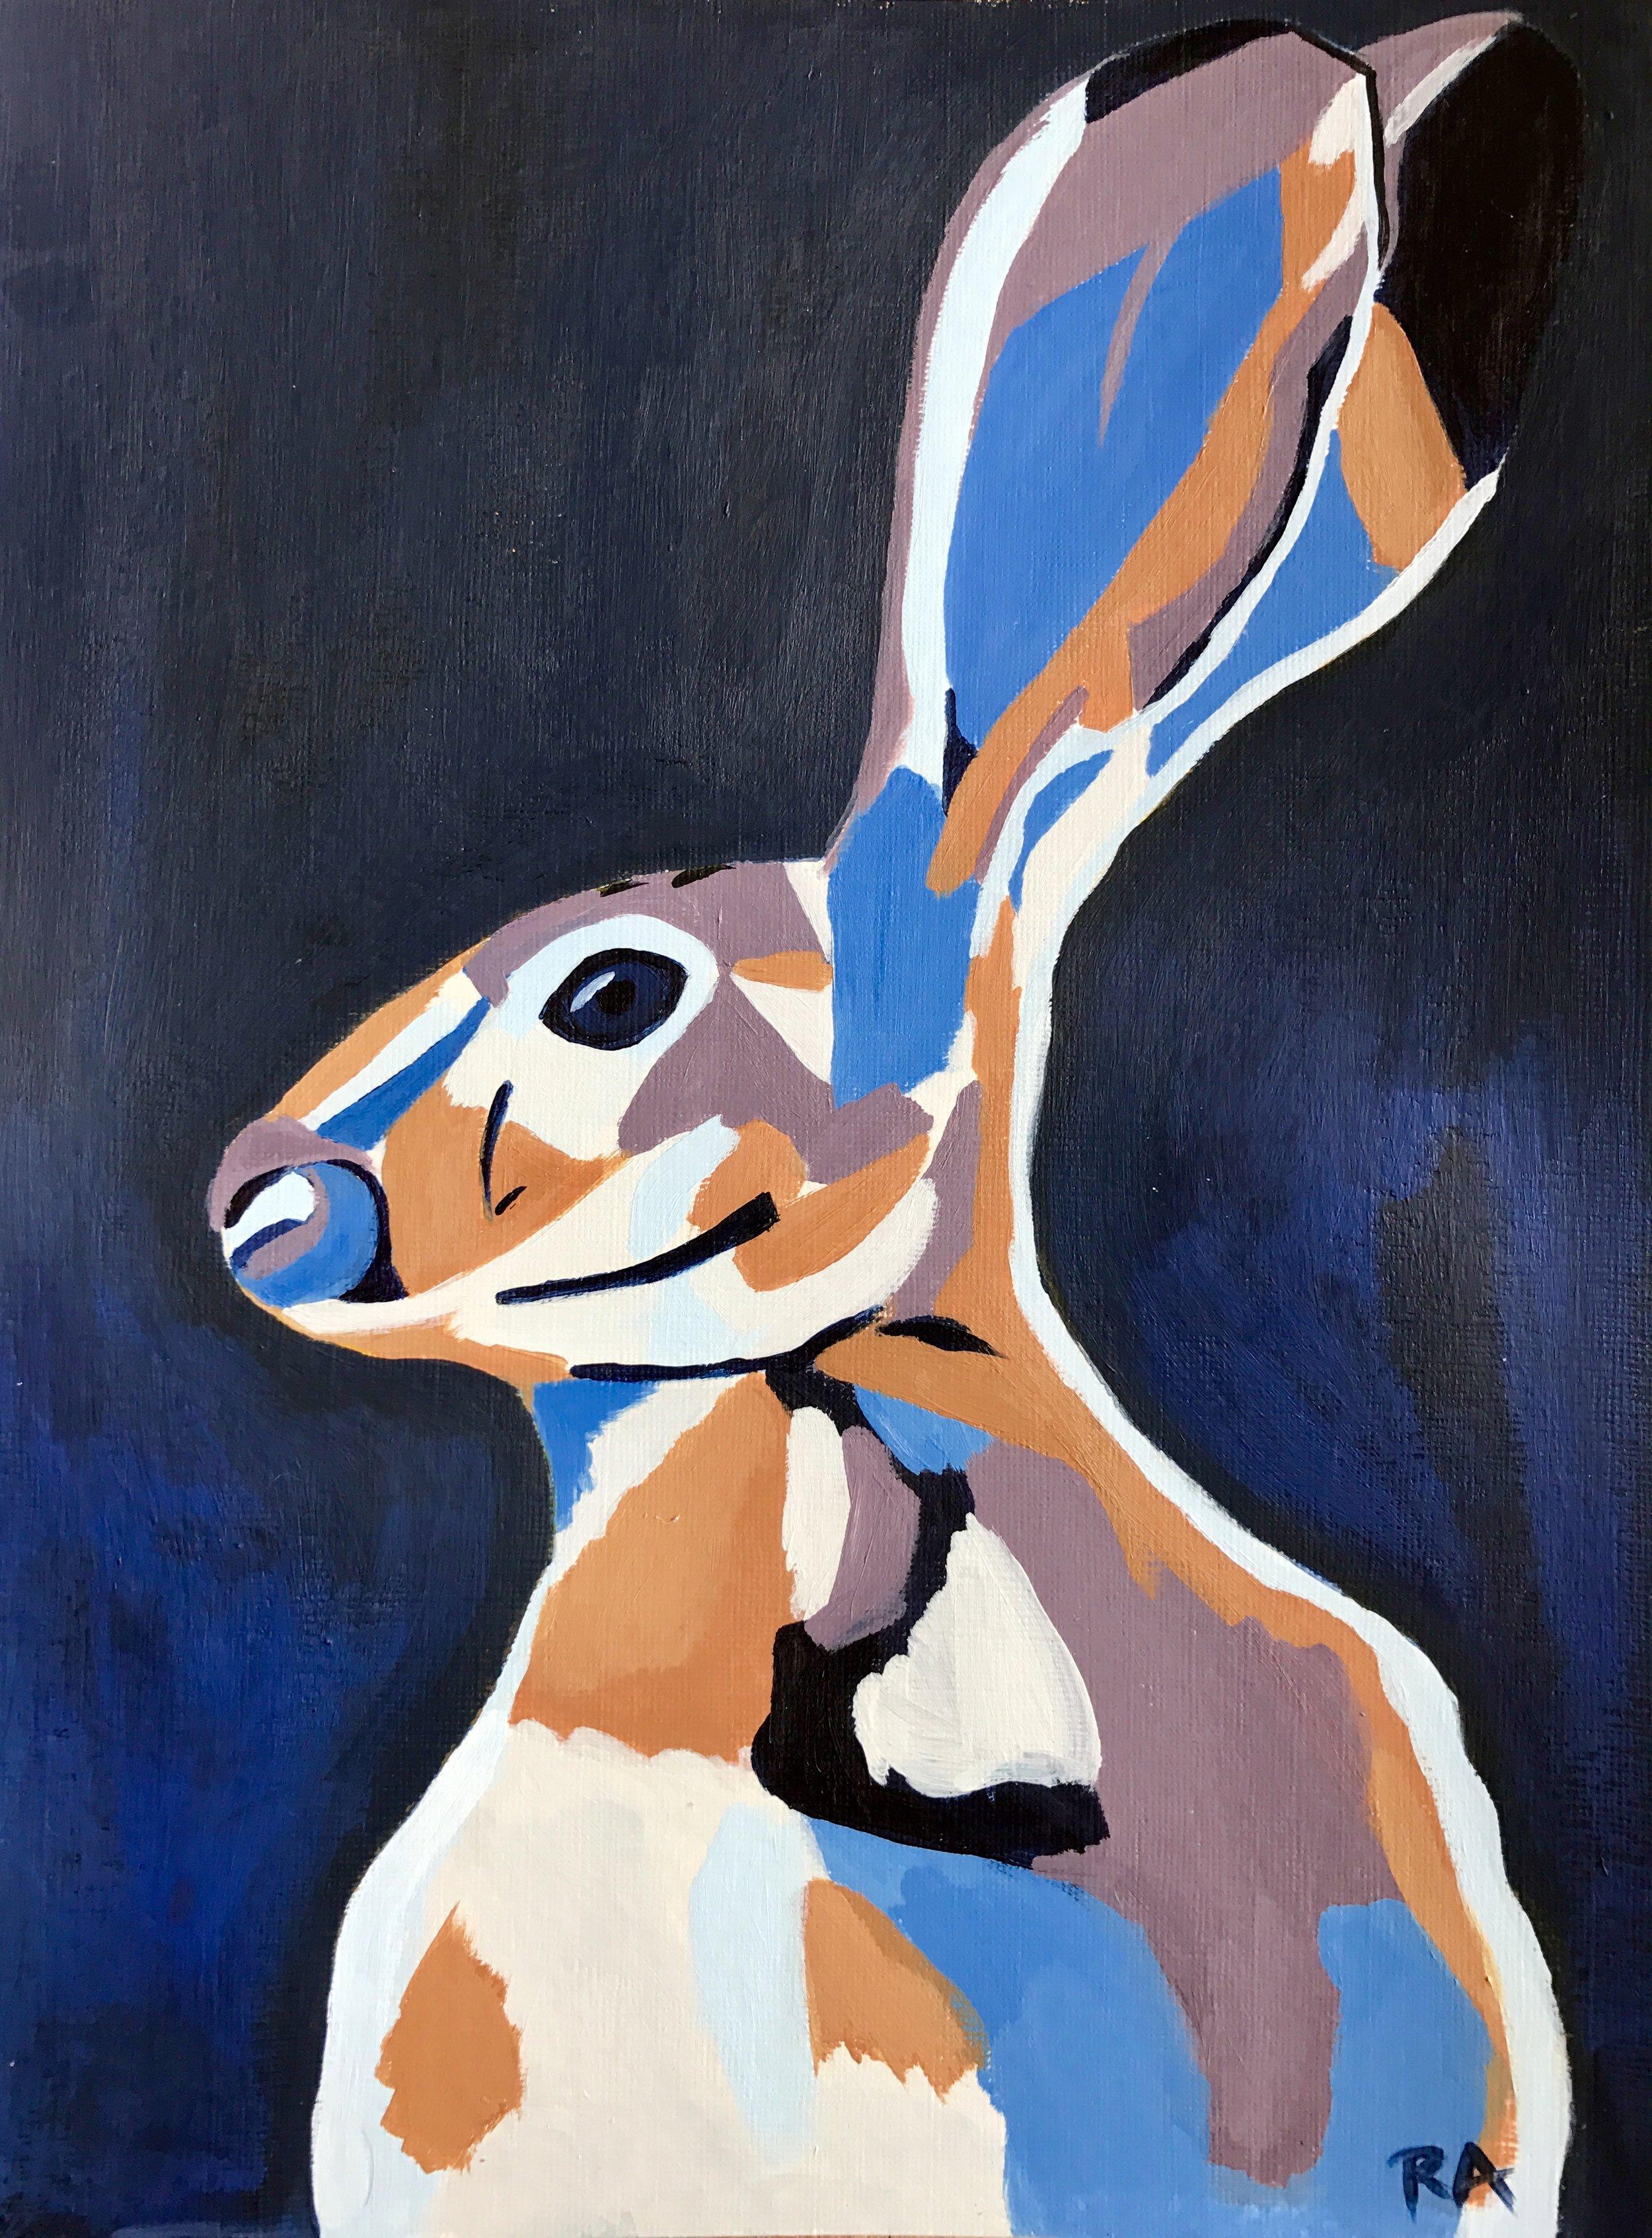 Midnight Hare, acrylic on paper, 2016